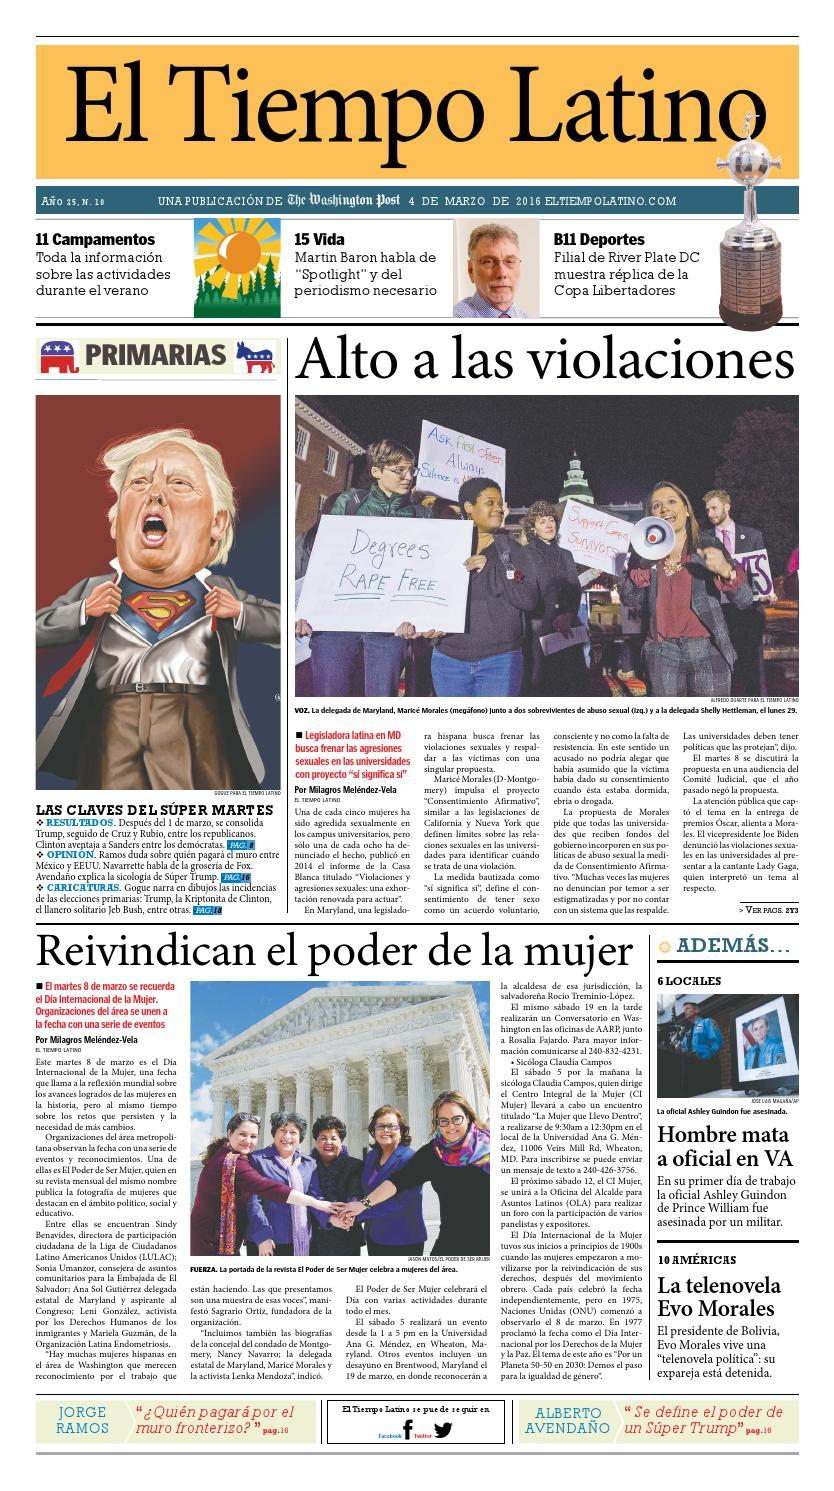 ETL 3-4-16 by El Tiempo Latino /TWP - issuu